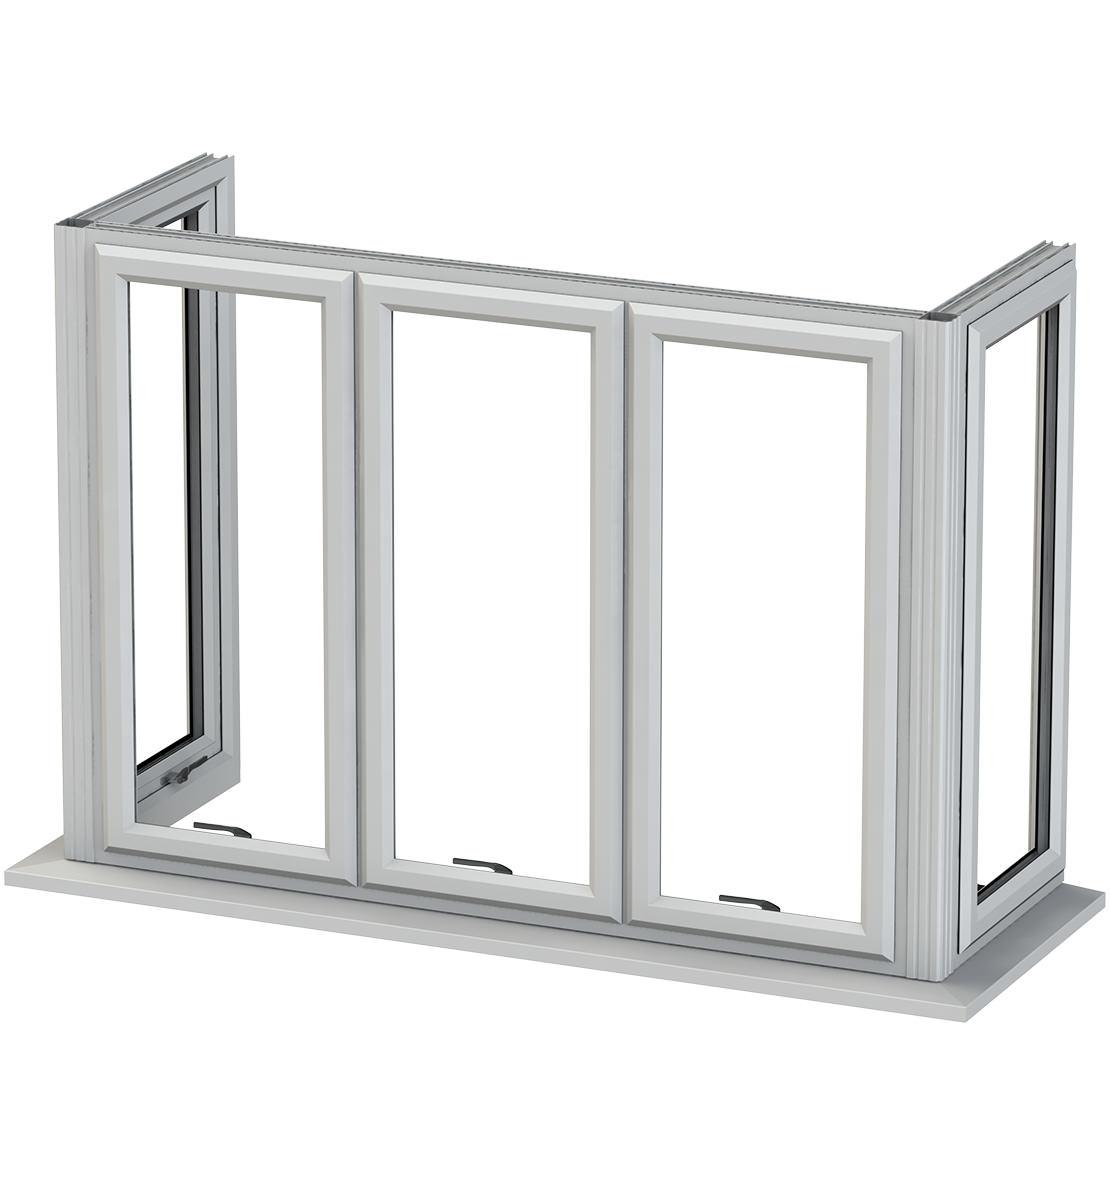 supply double glazing bristol